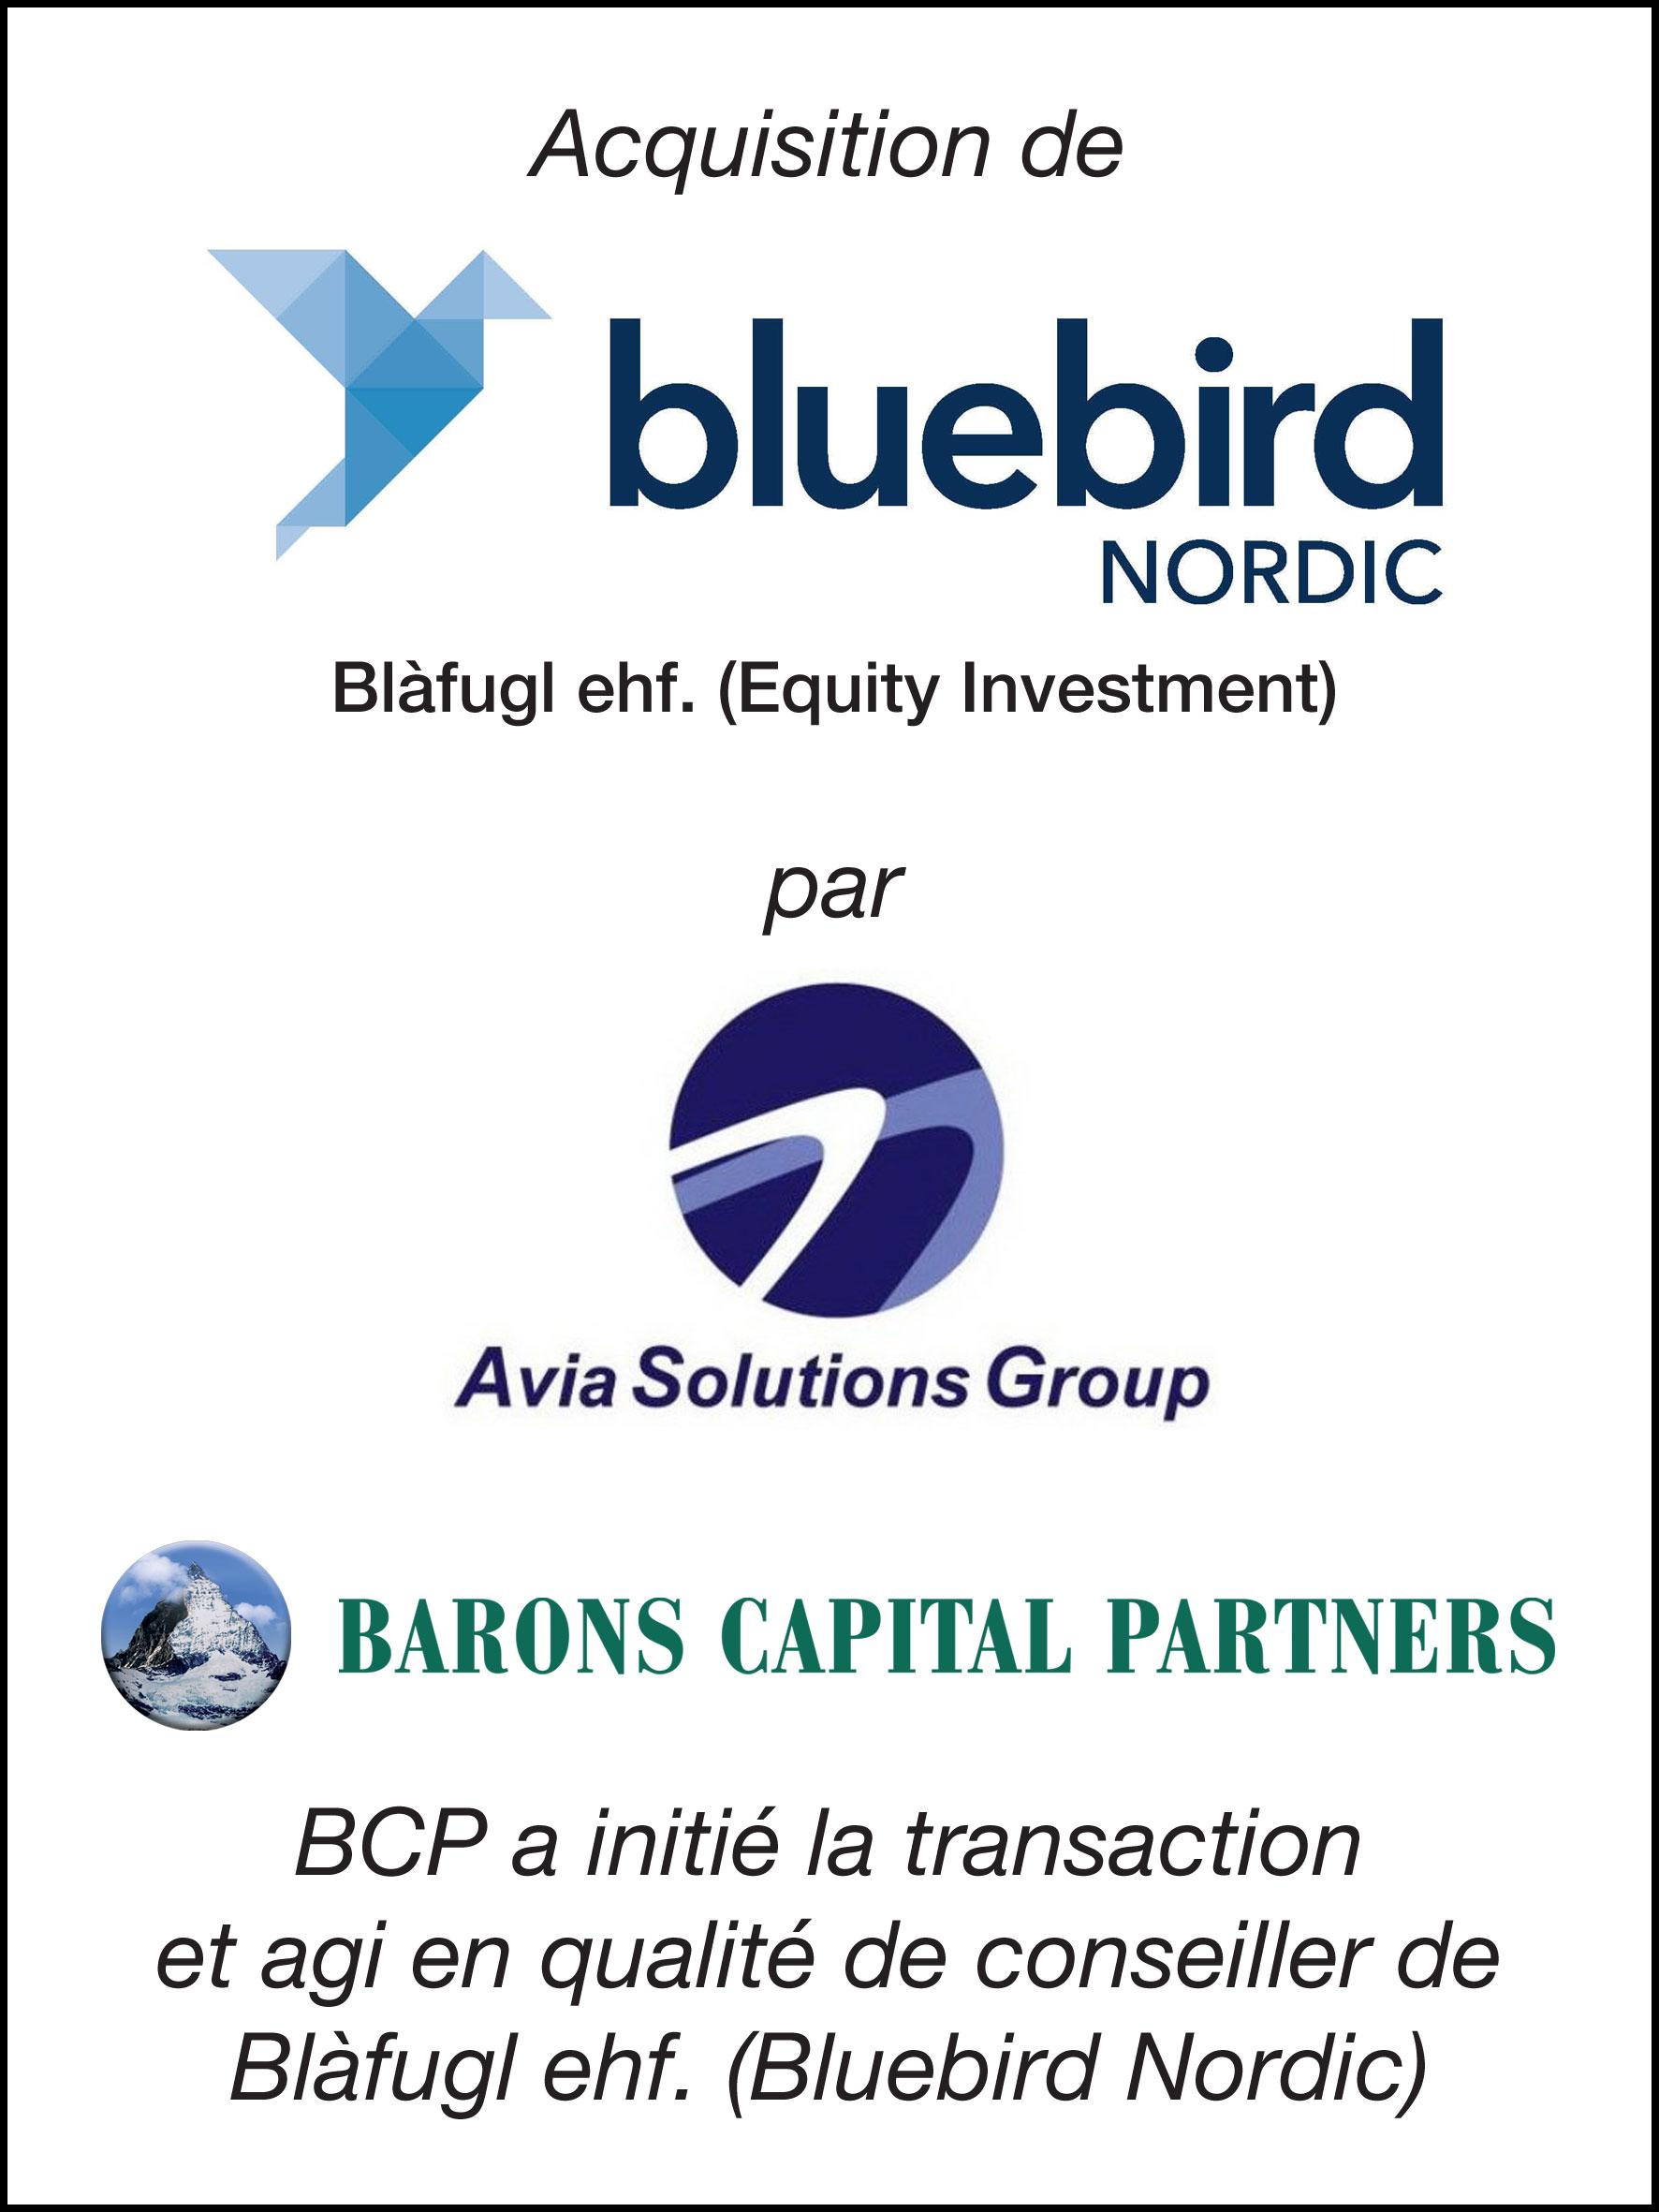 5_Blàfugl ehf. (Bluebird Nordic)_F